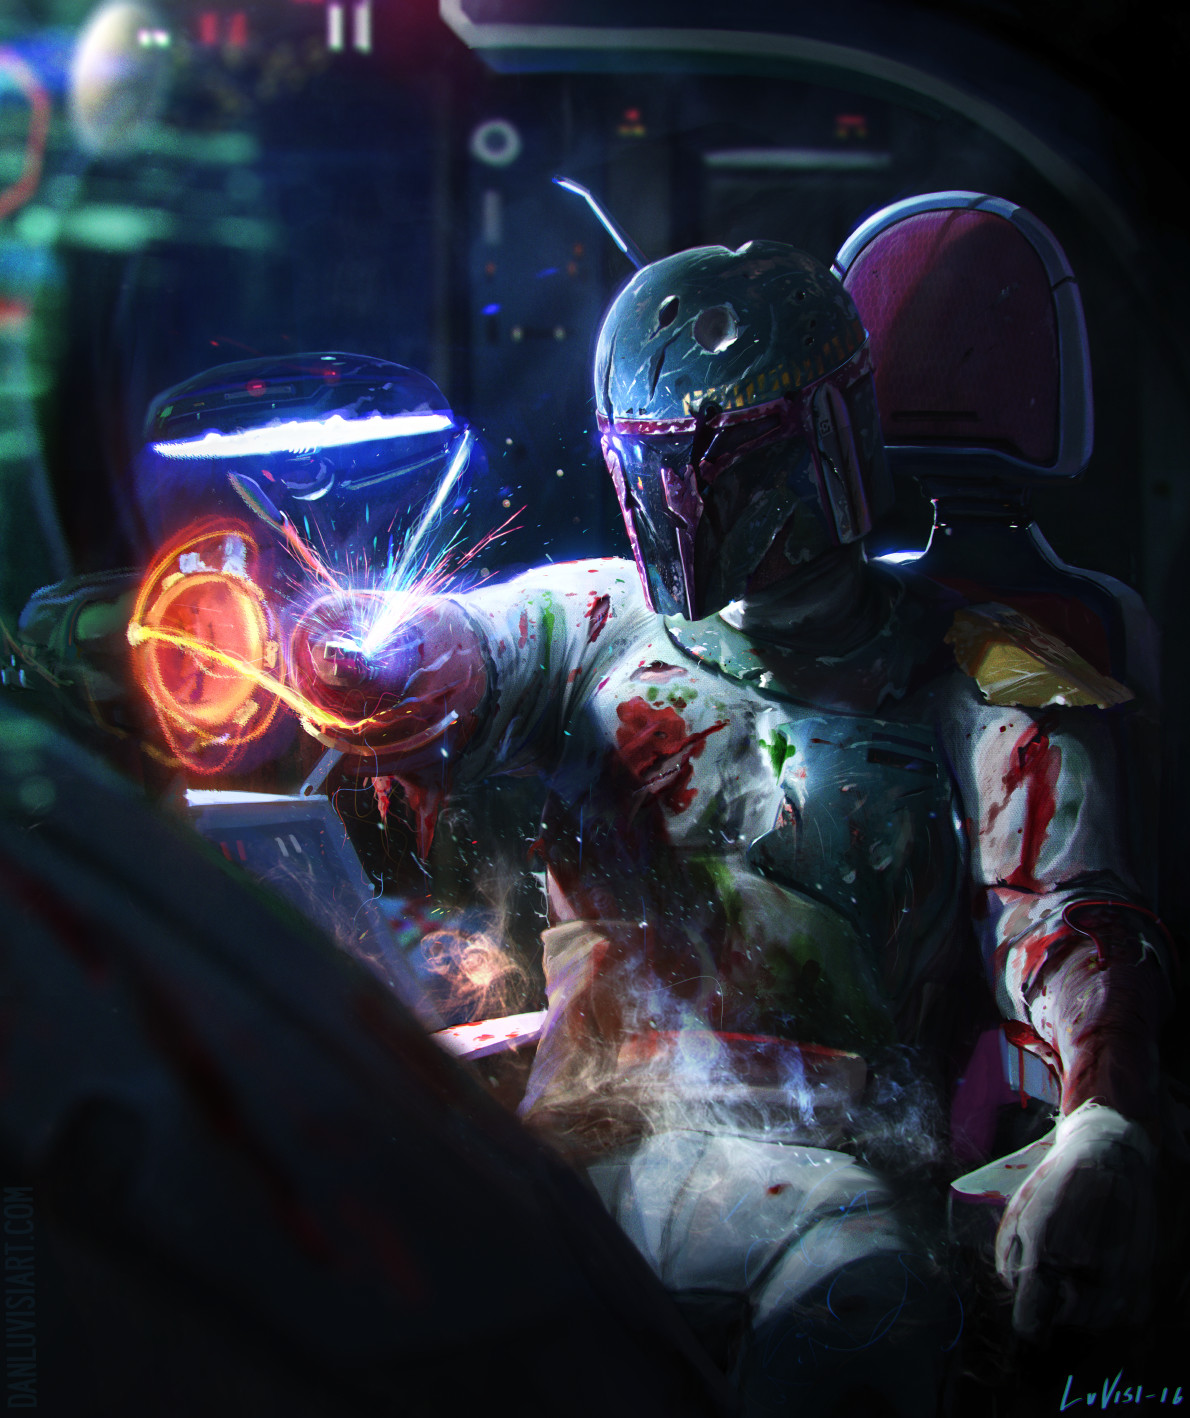 Star Wars Science Fiction Dan Luvisi Star Wars Villains Villains Bounty Hunter Boba Fett 1190x1418